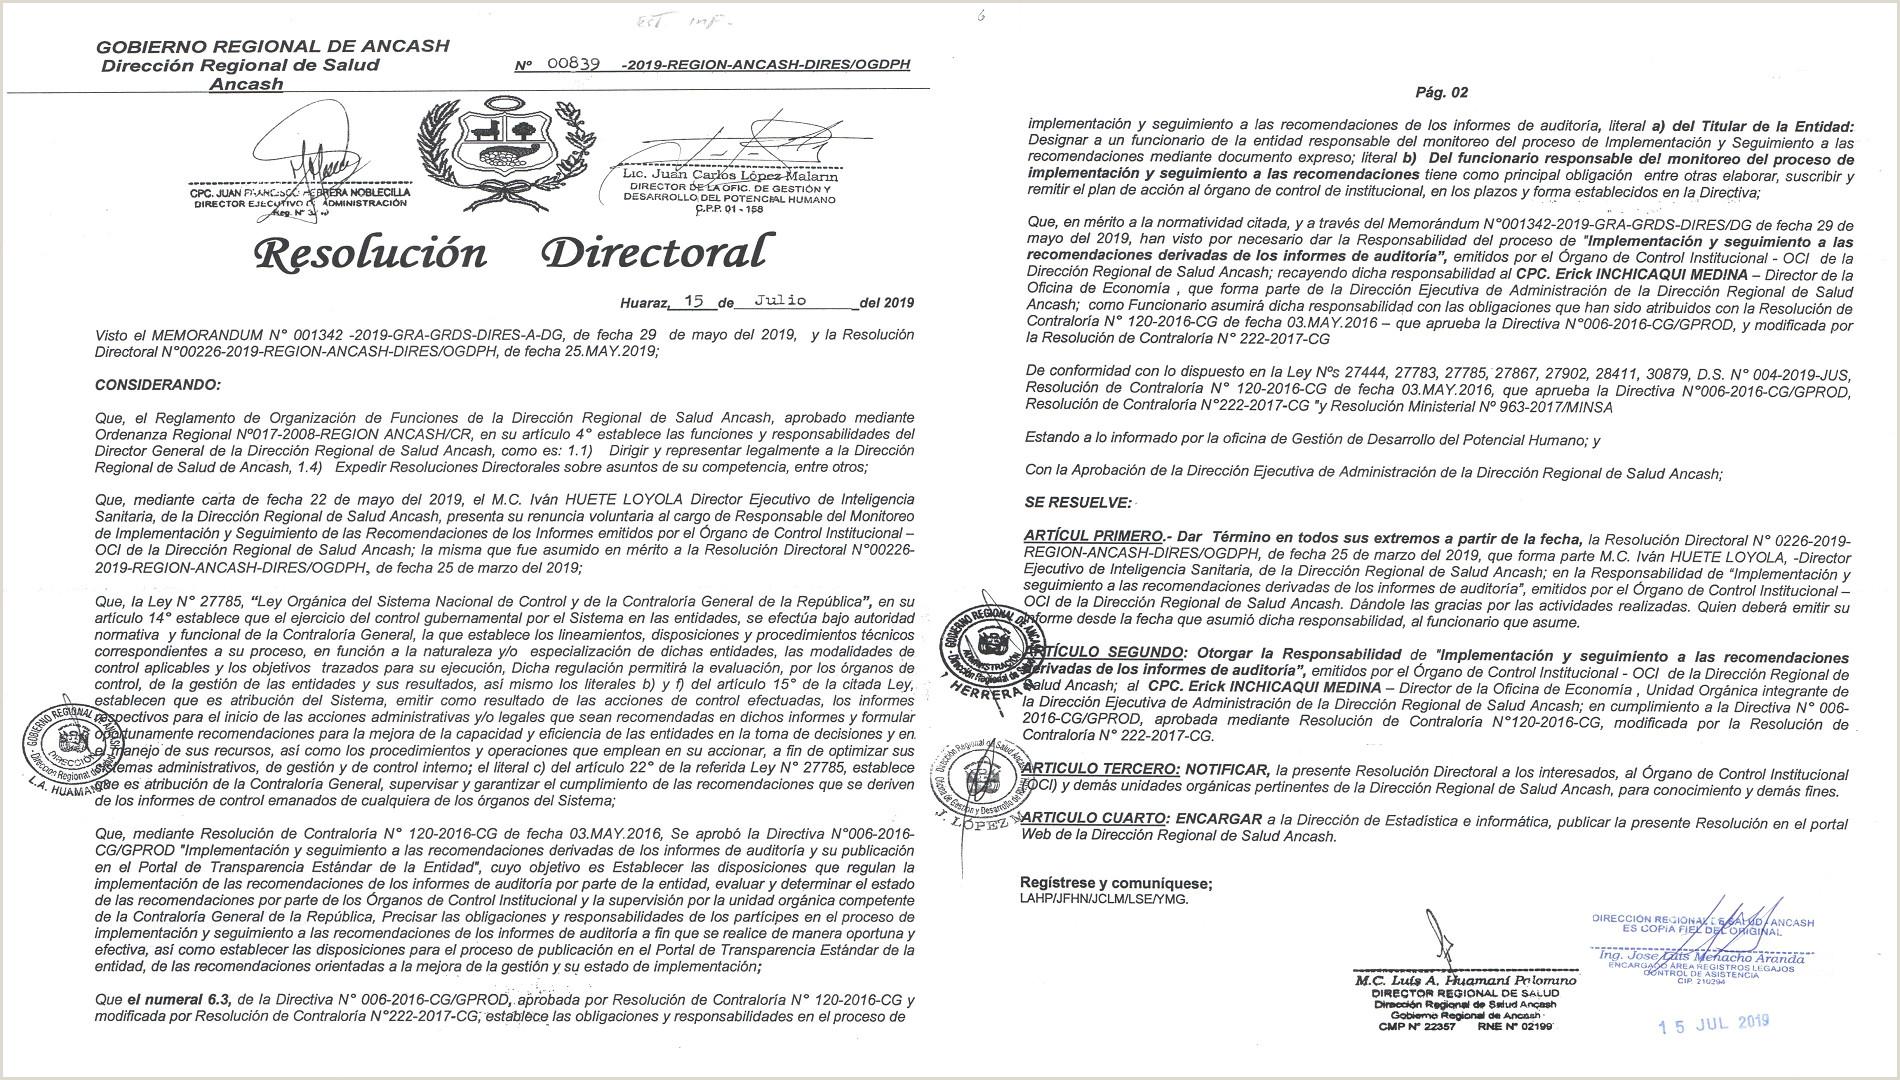 Direcci³n Regional de Salud Ancash